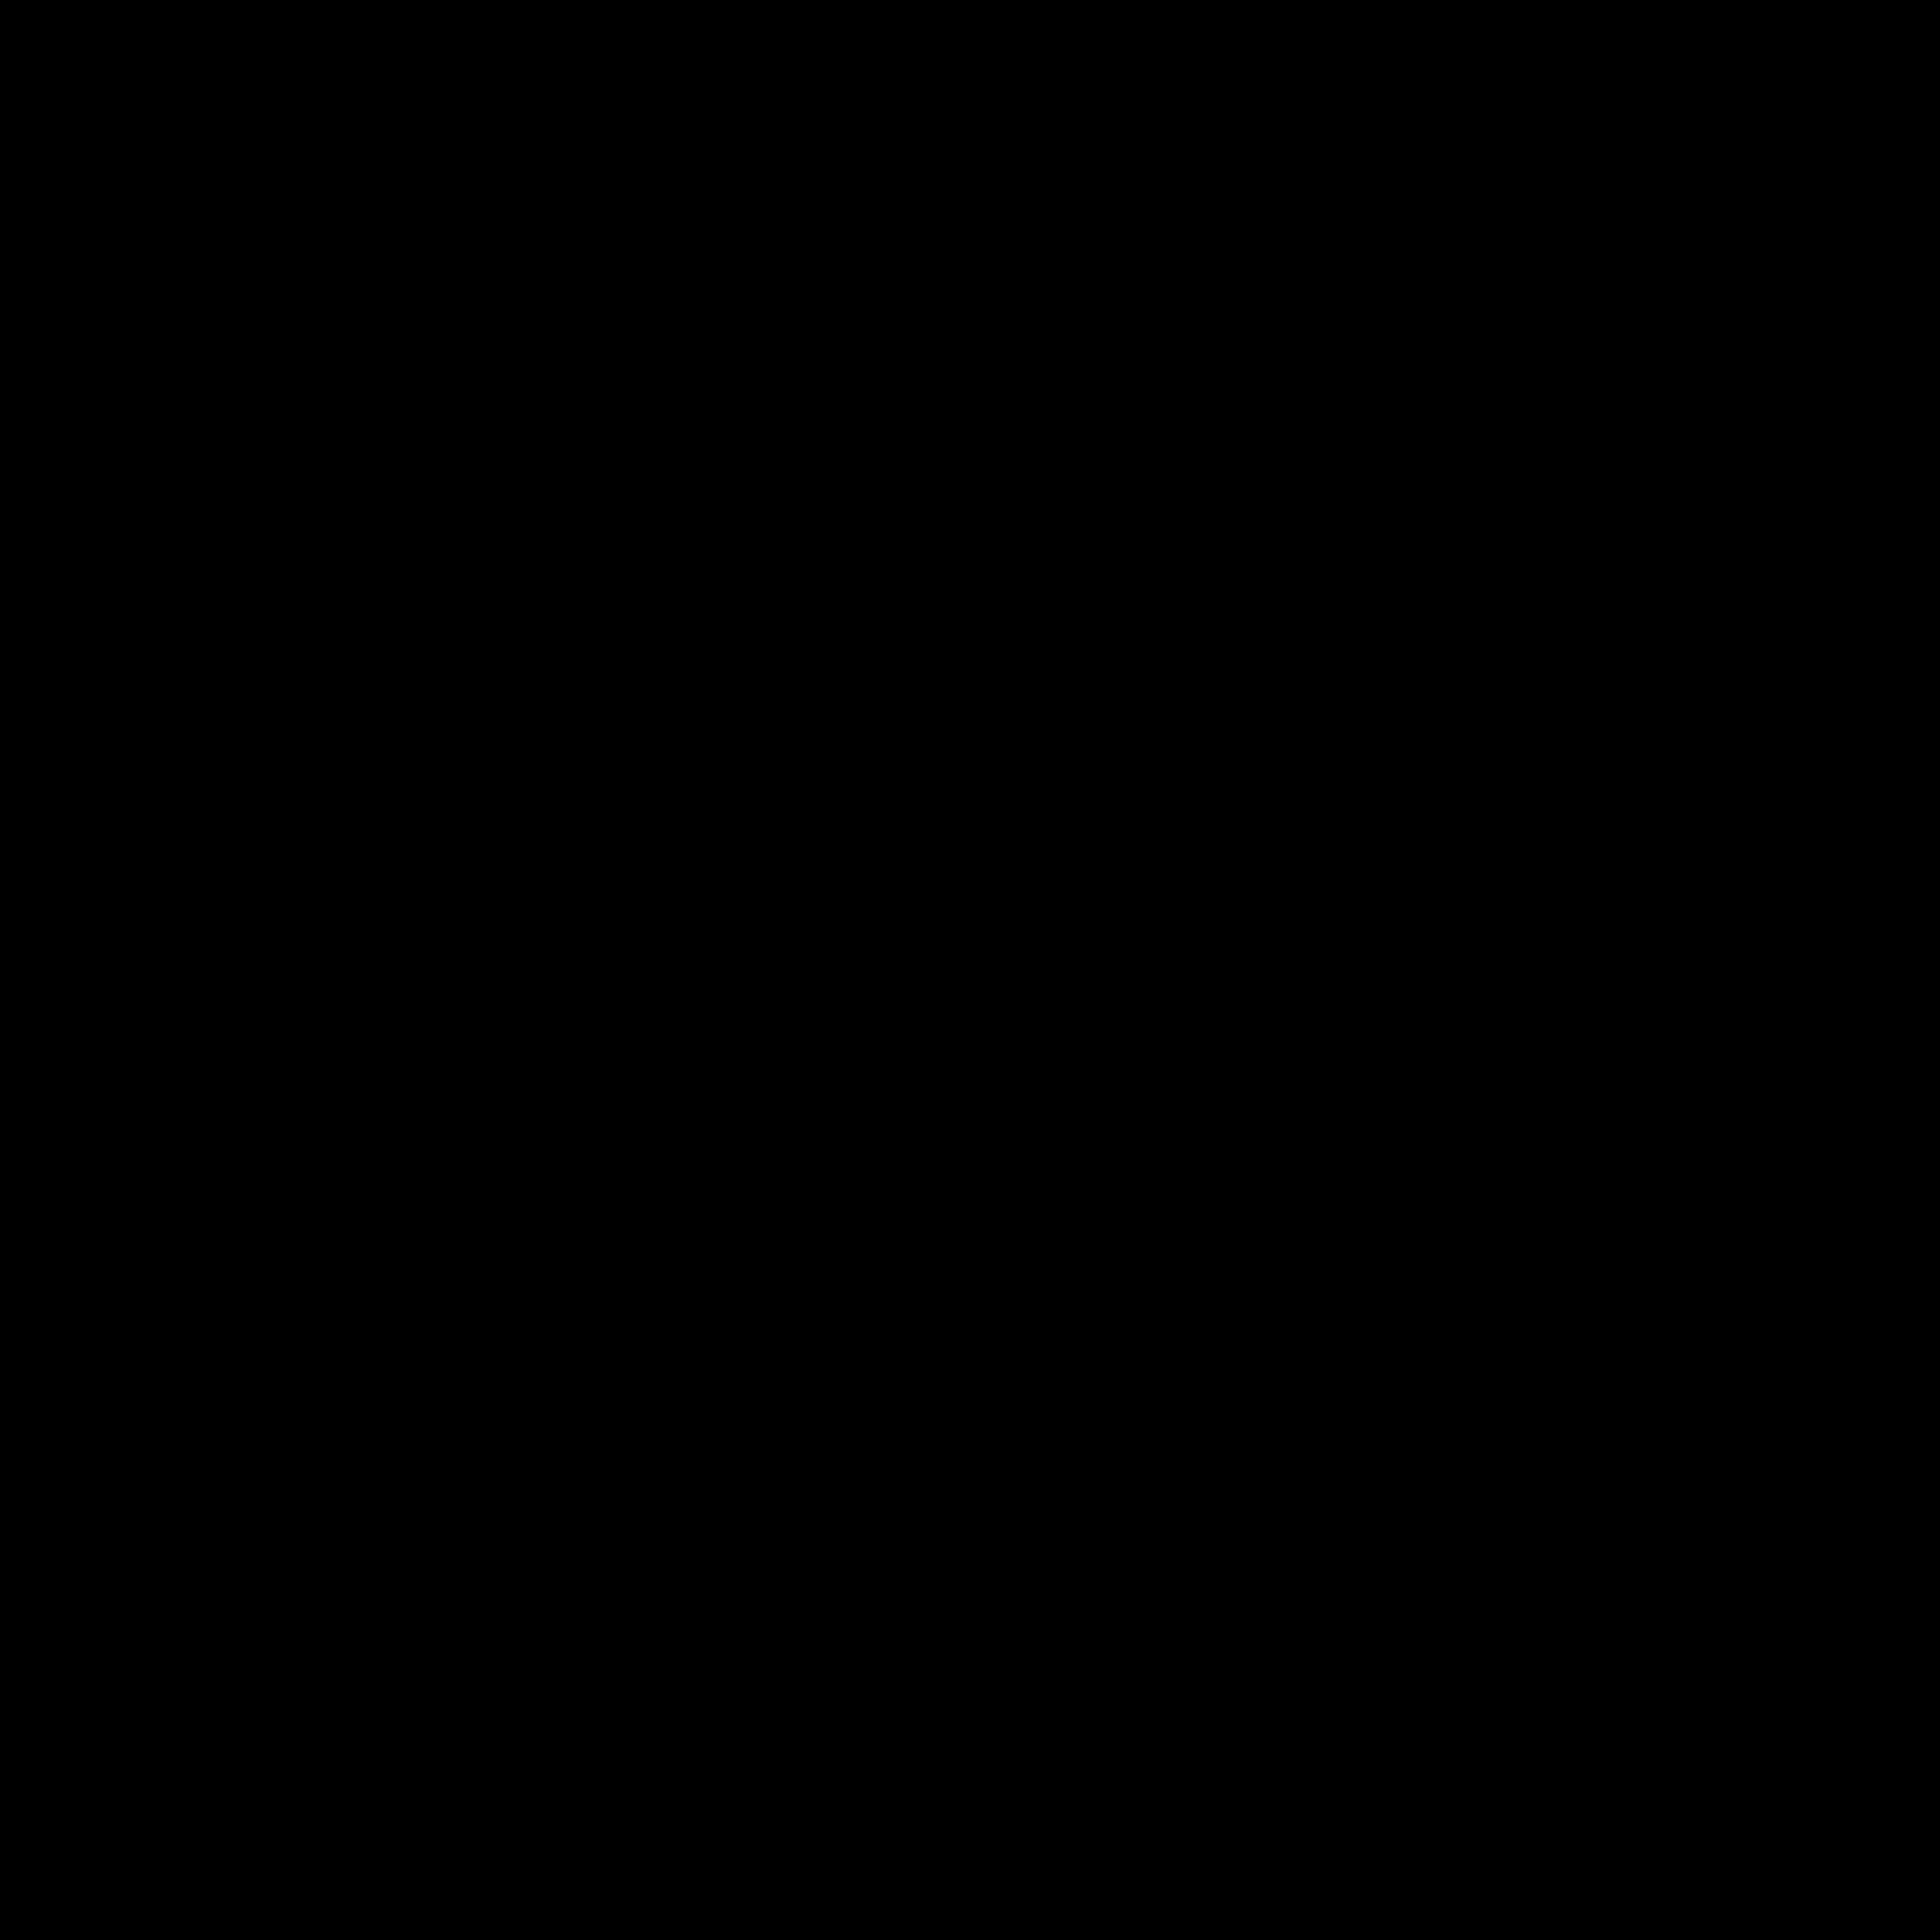 دولتشي اند غابانا